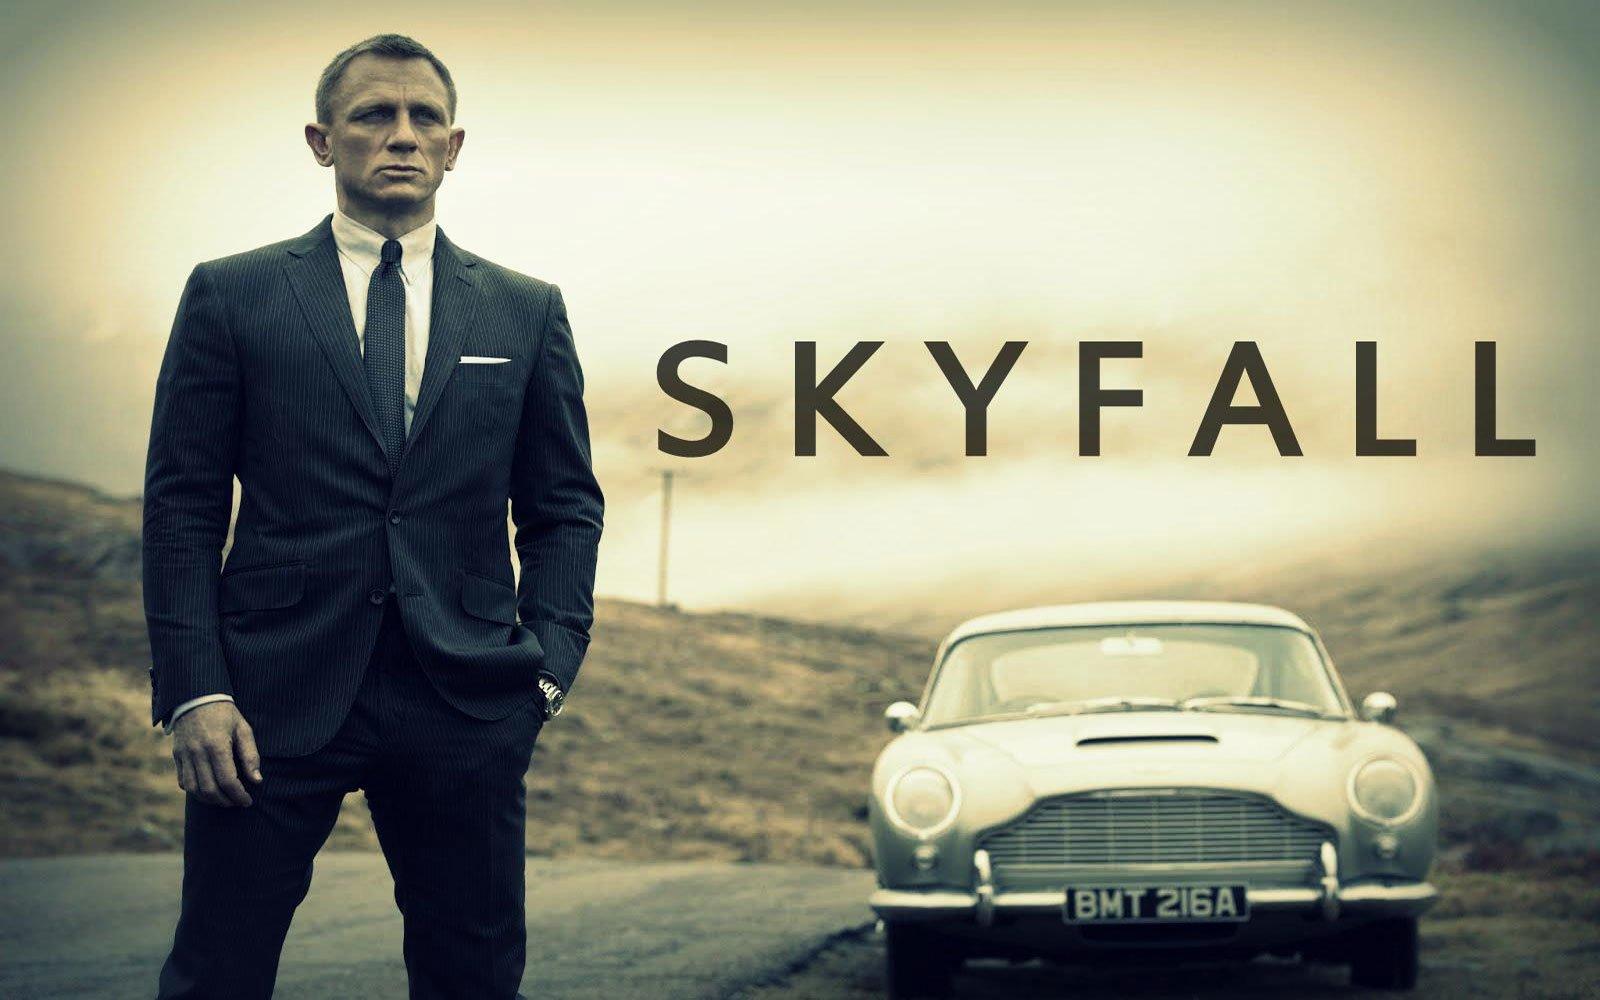 Daniel craig skyfall wallpaper and background image - Daniel craig bond wallpaper ...